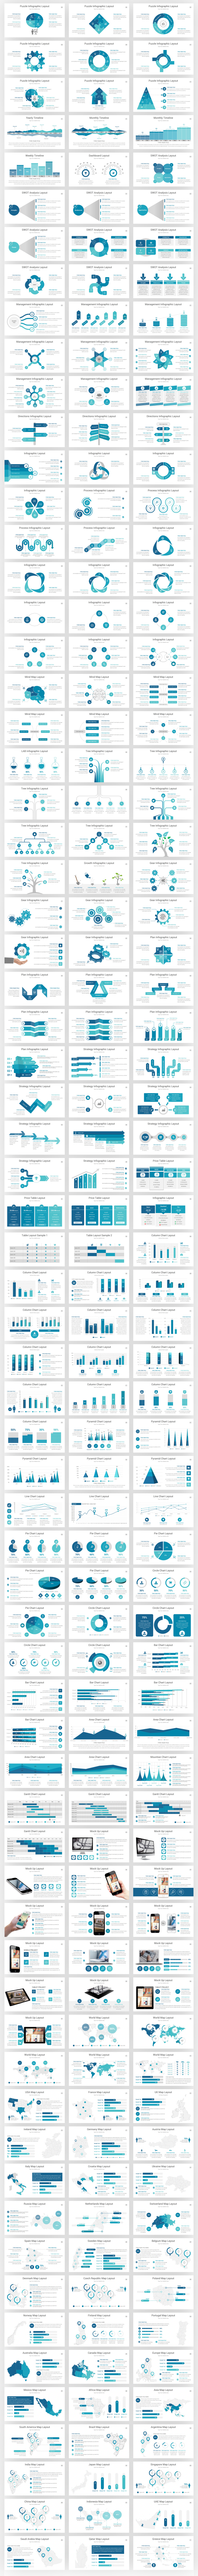 PRO Multipurpose PowerPoint Presentation Template - 3